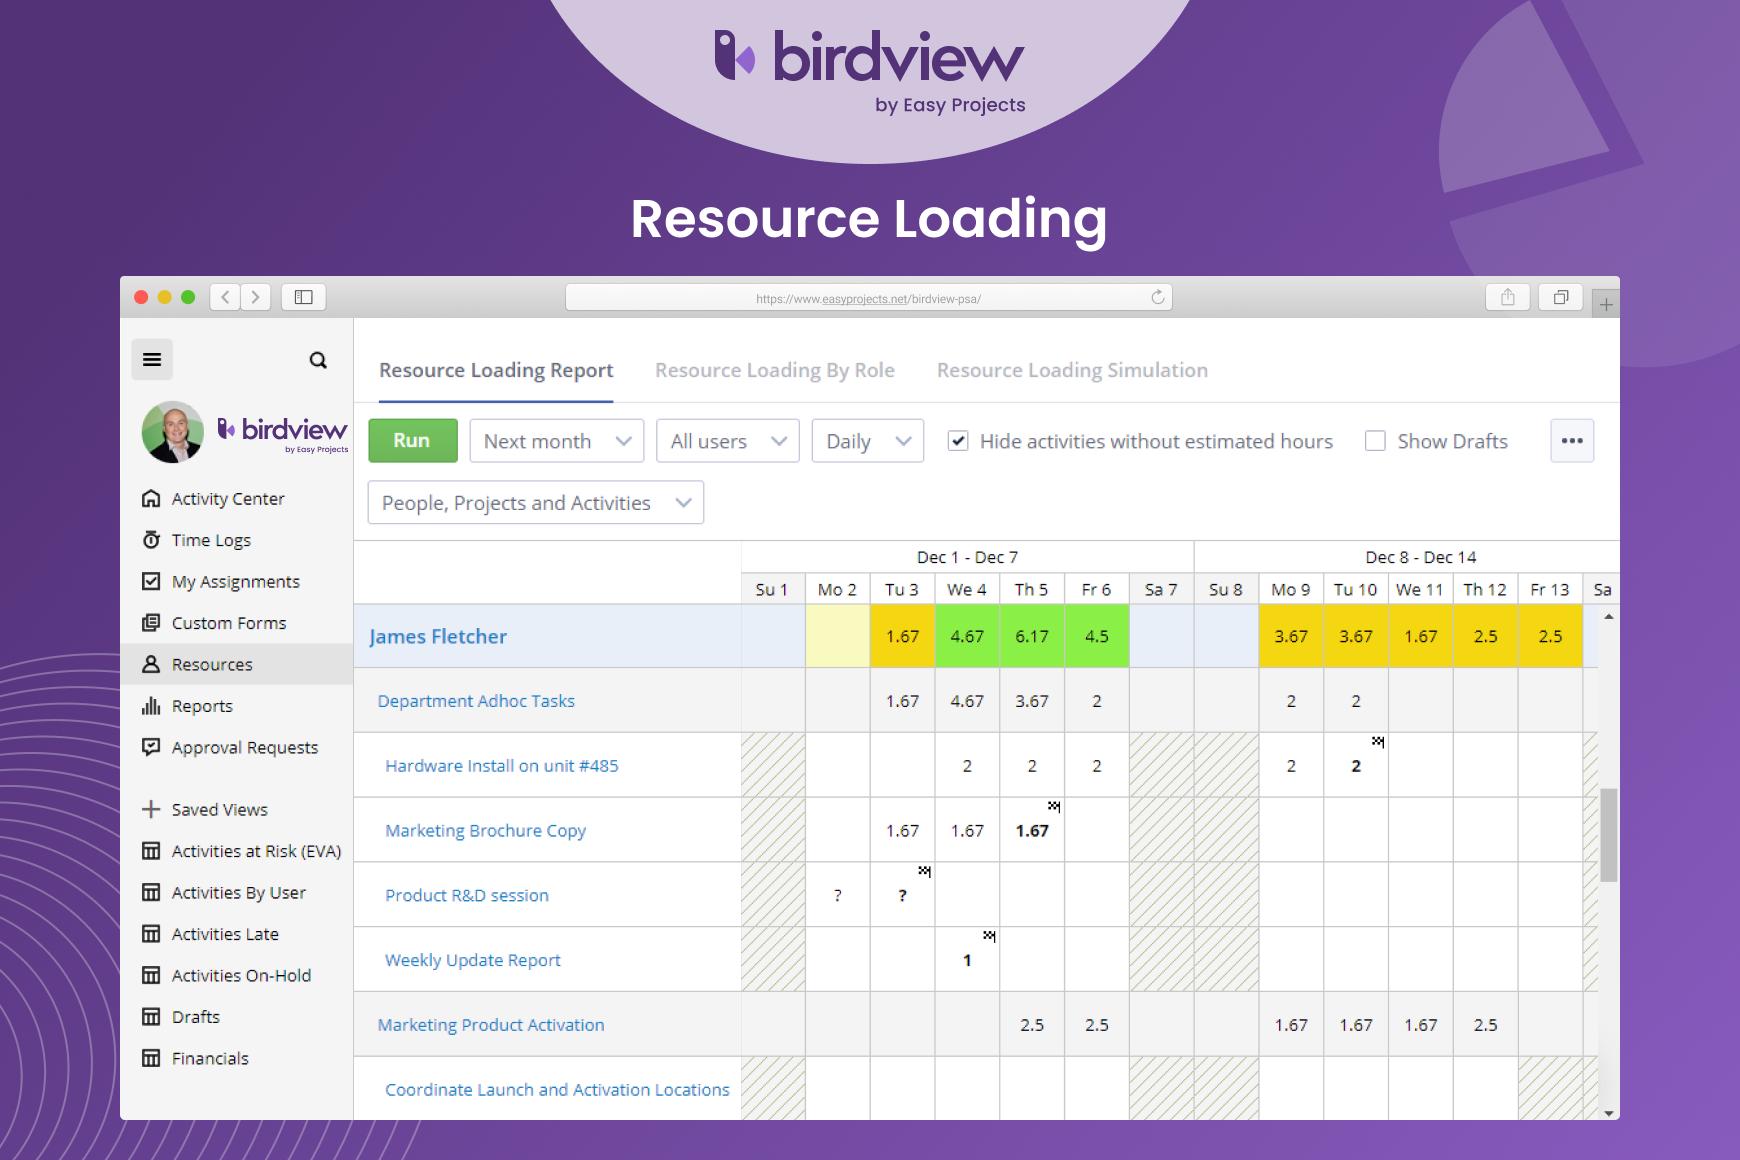 Birdview PSA - Resource Loading